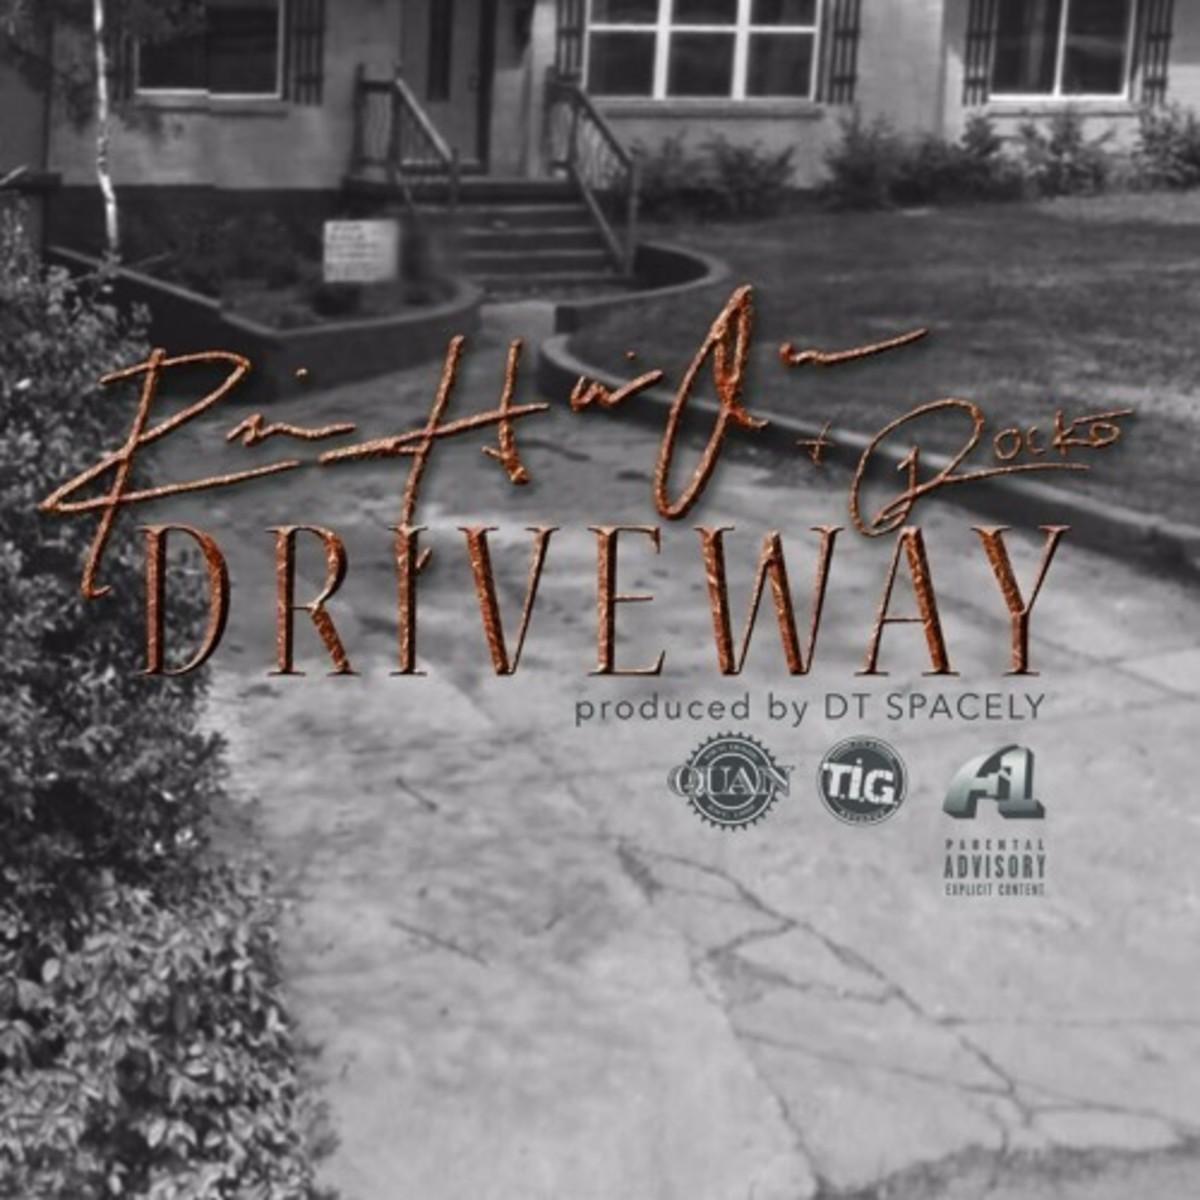 rich-homie-quan-driveway.jpg